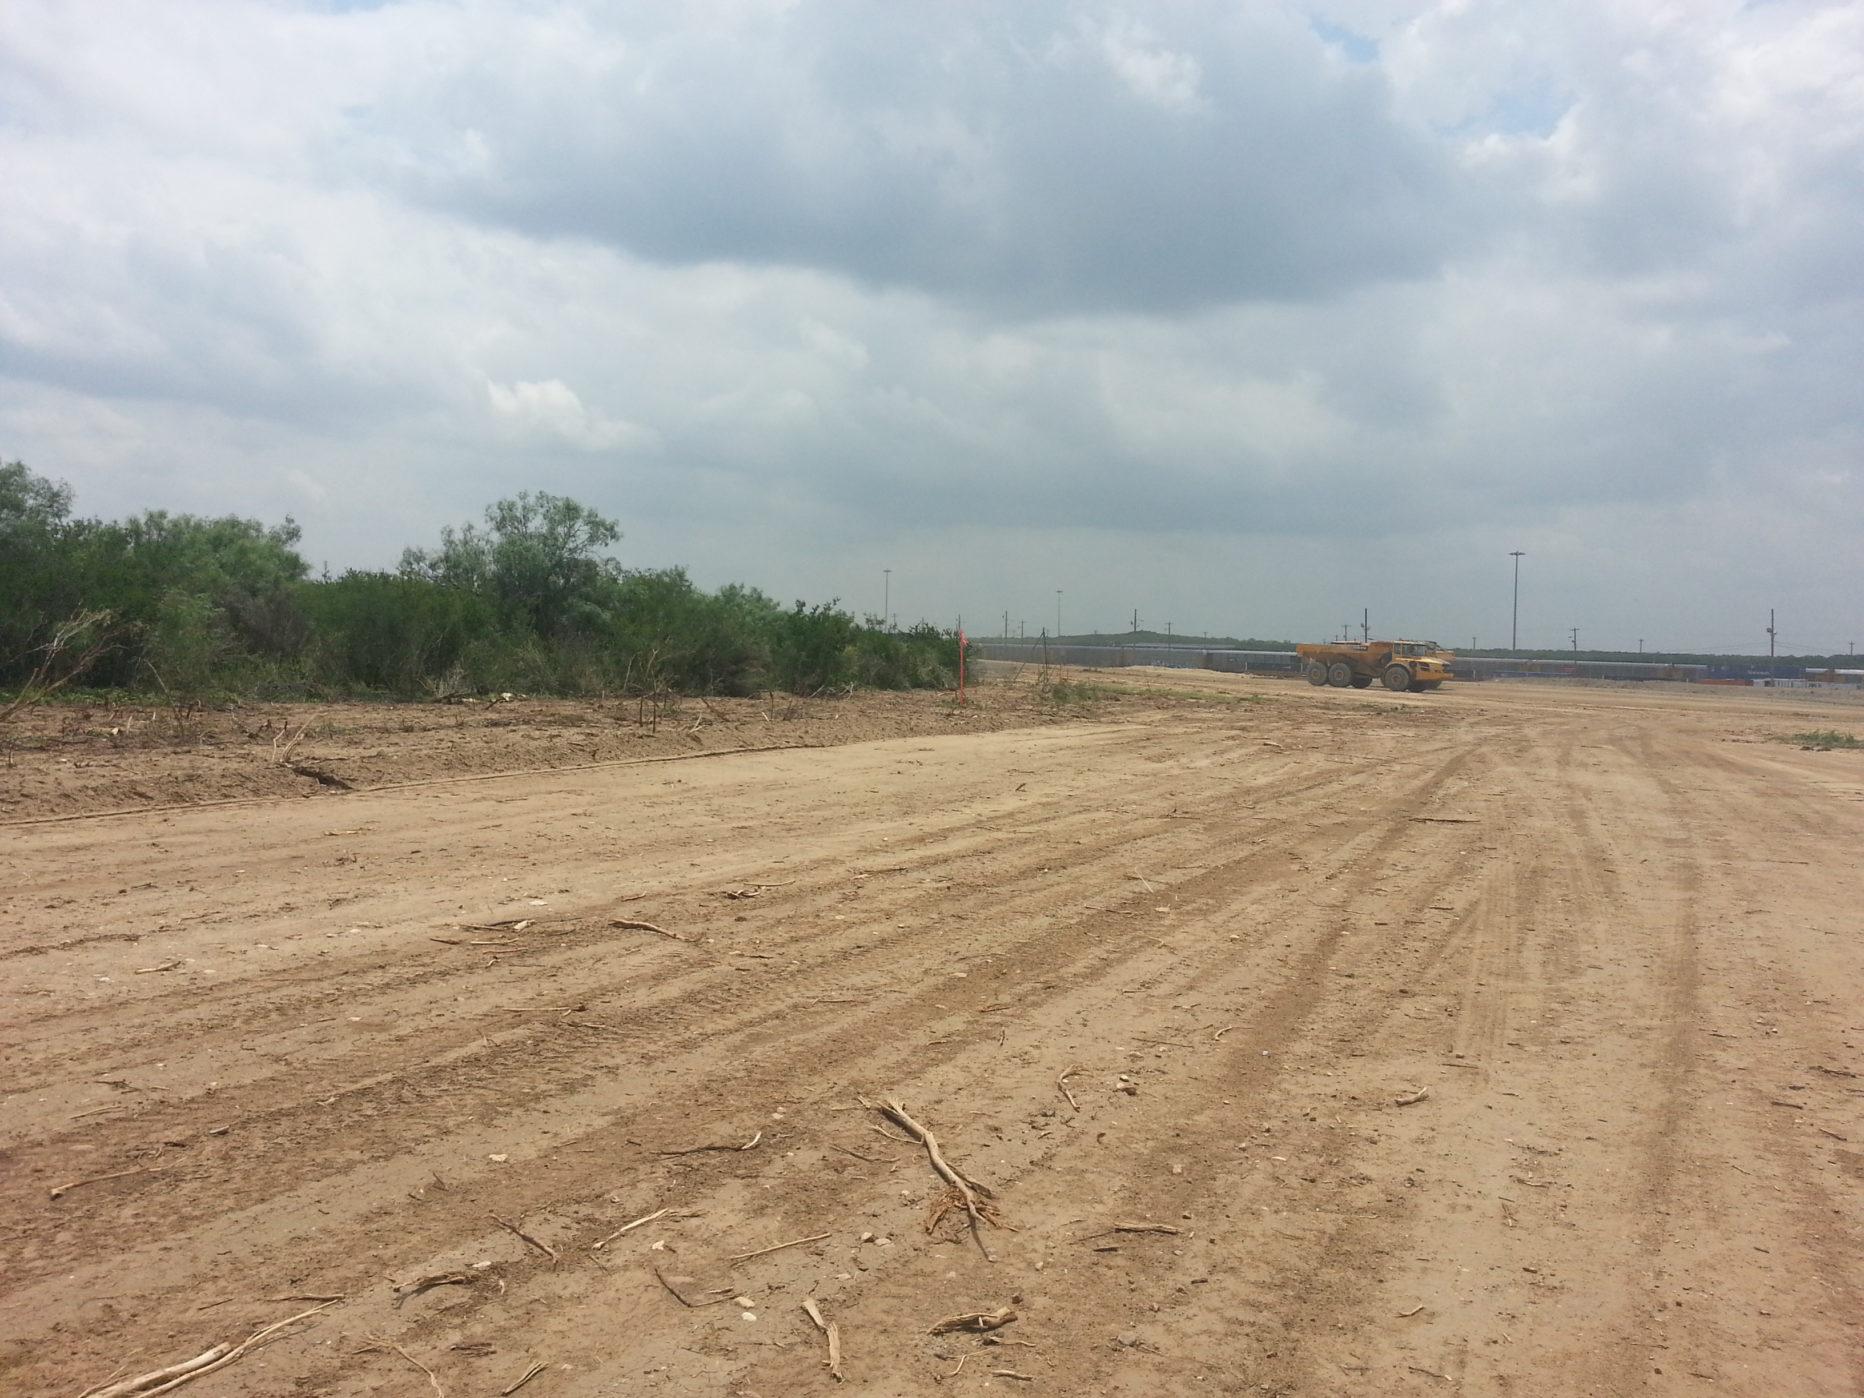 Port Laredo Intermodal Expansion Construction Site